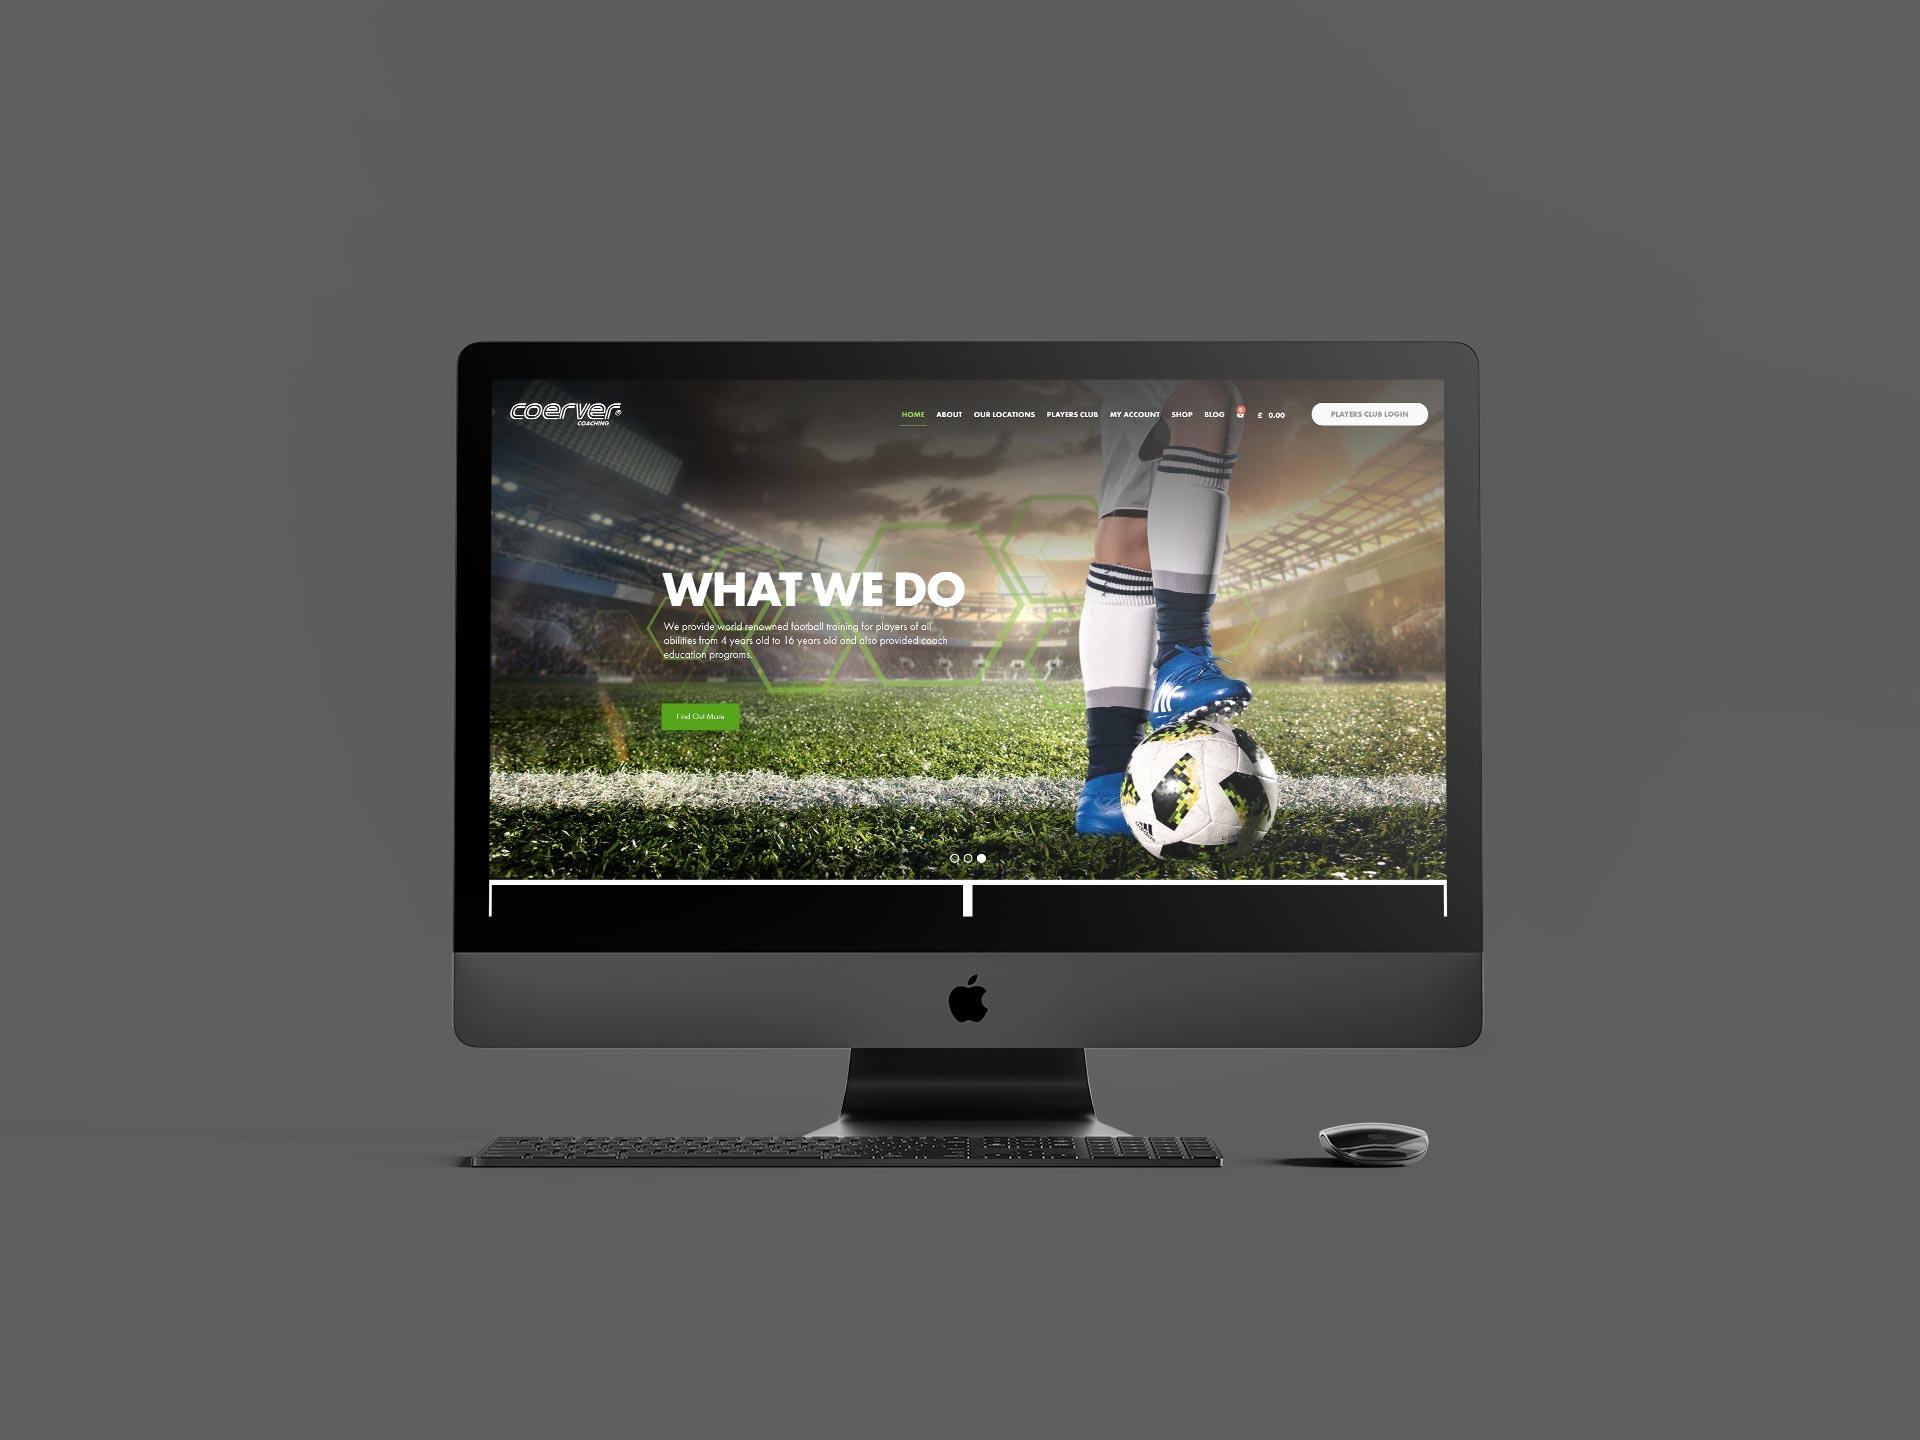 Coerver Coaching Website